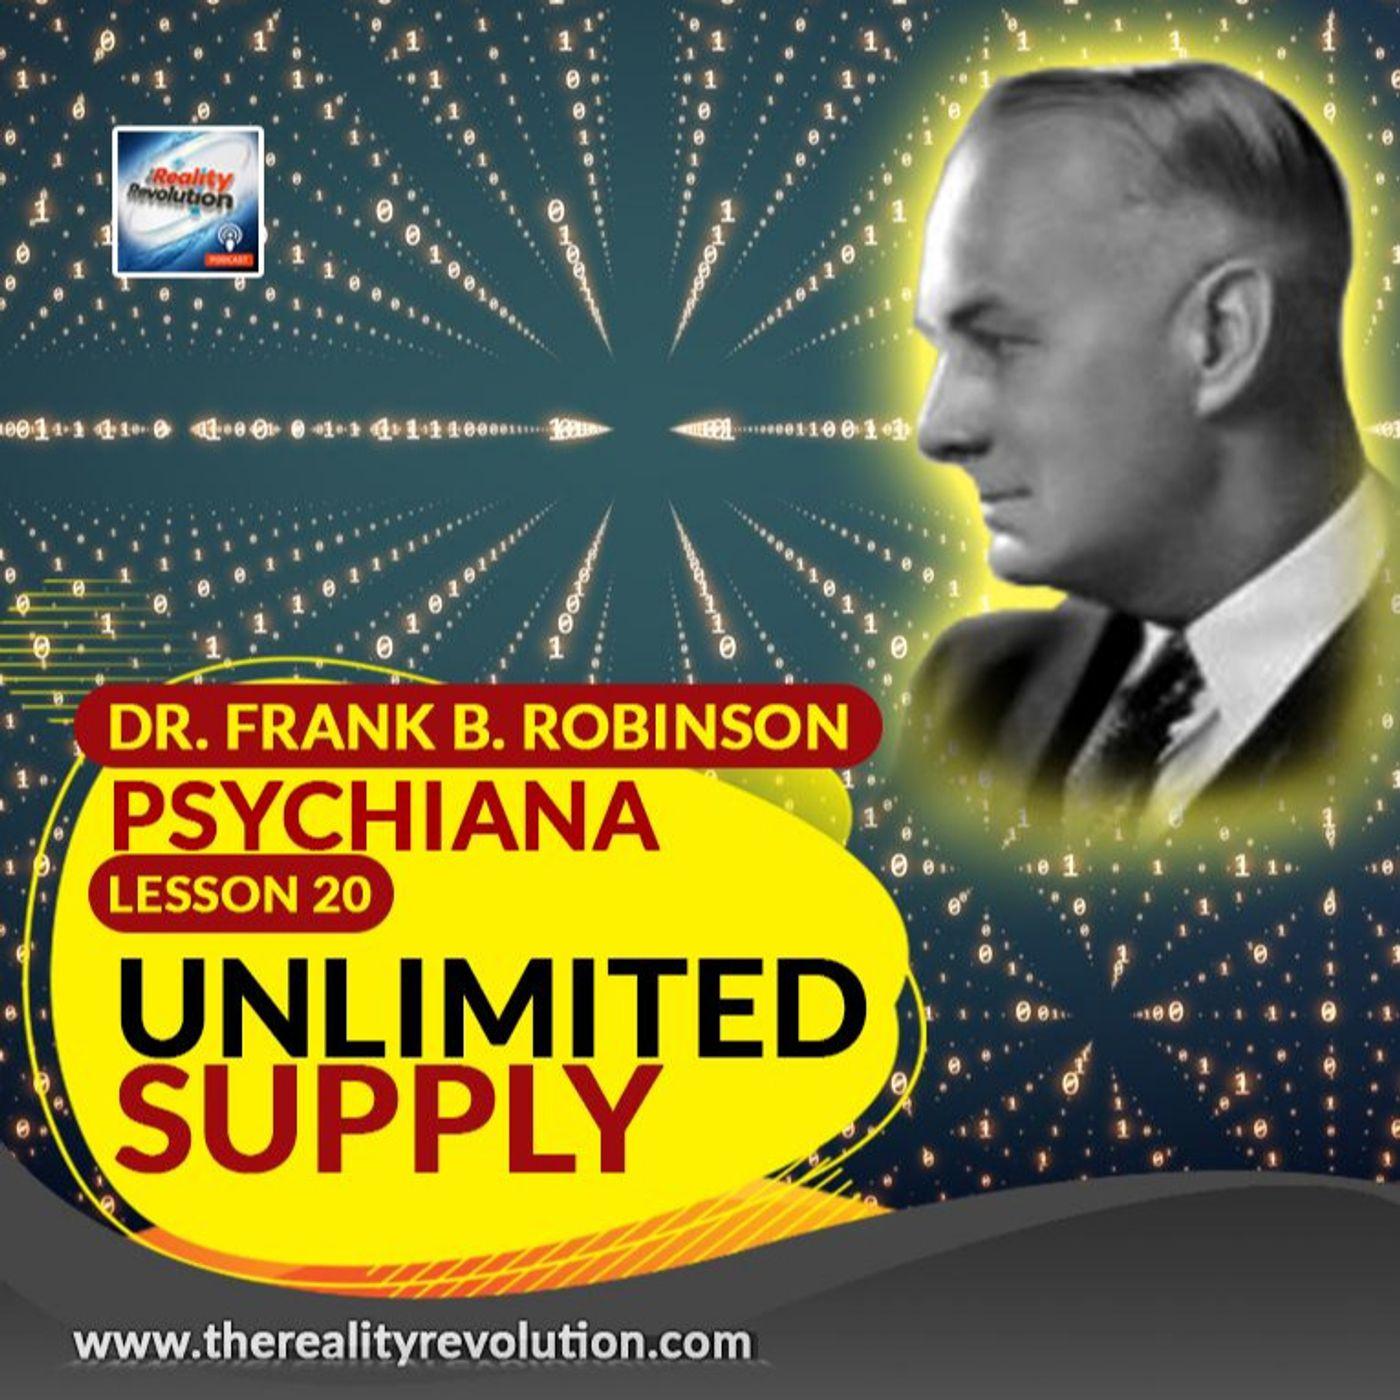 Dr Frank B Robinson Psychiana Lesson 20 Unlimited Supply